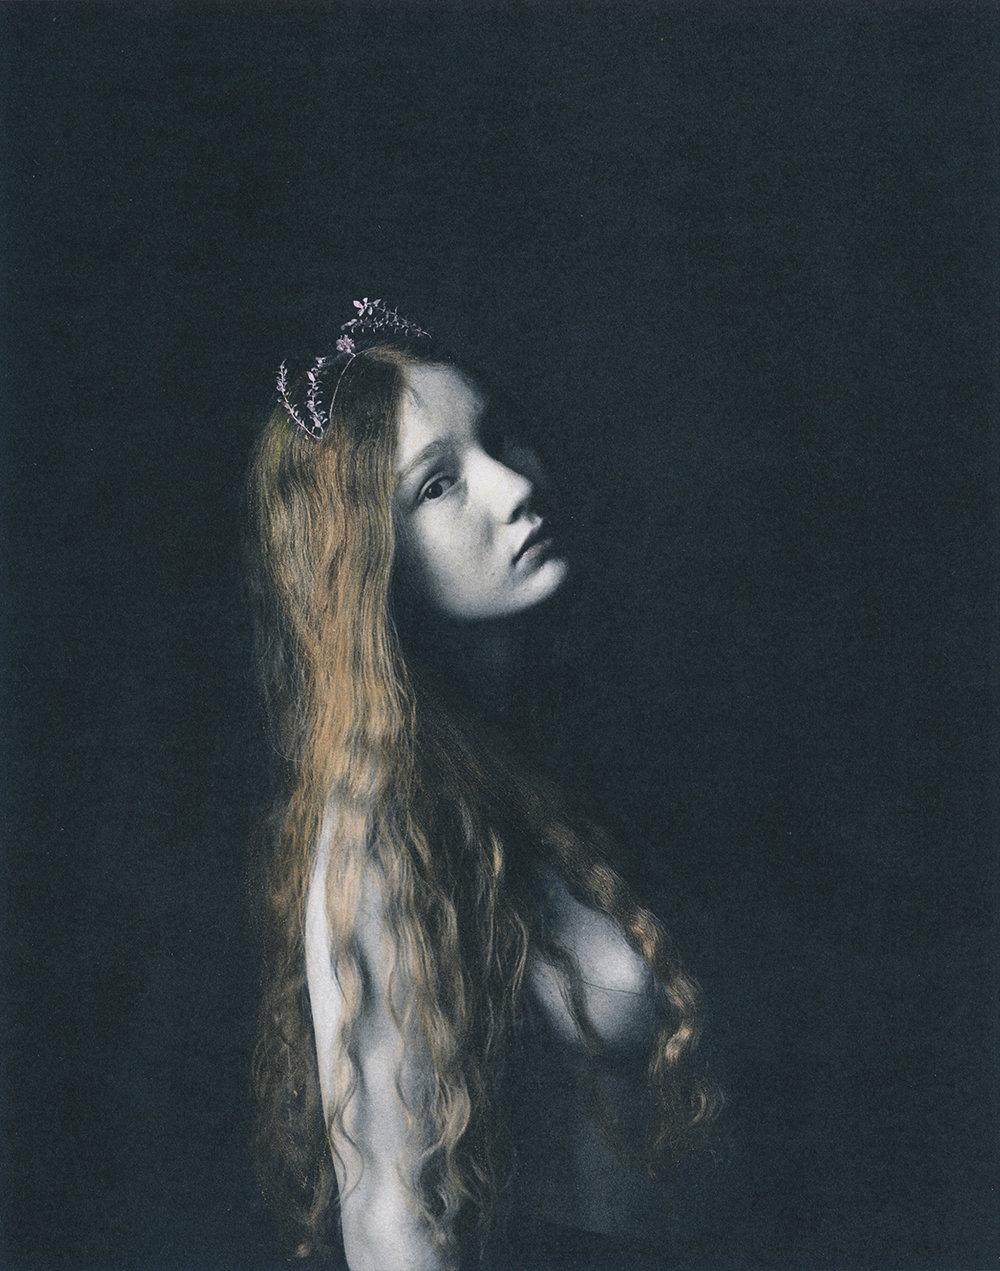 Untitled, Klara Johanna Michel